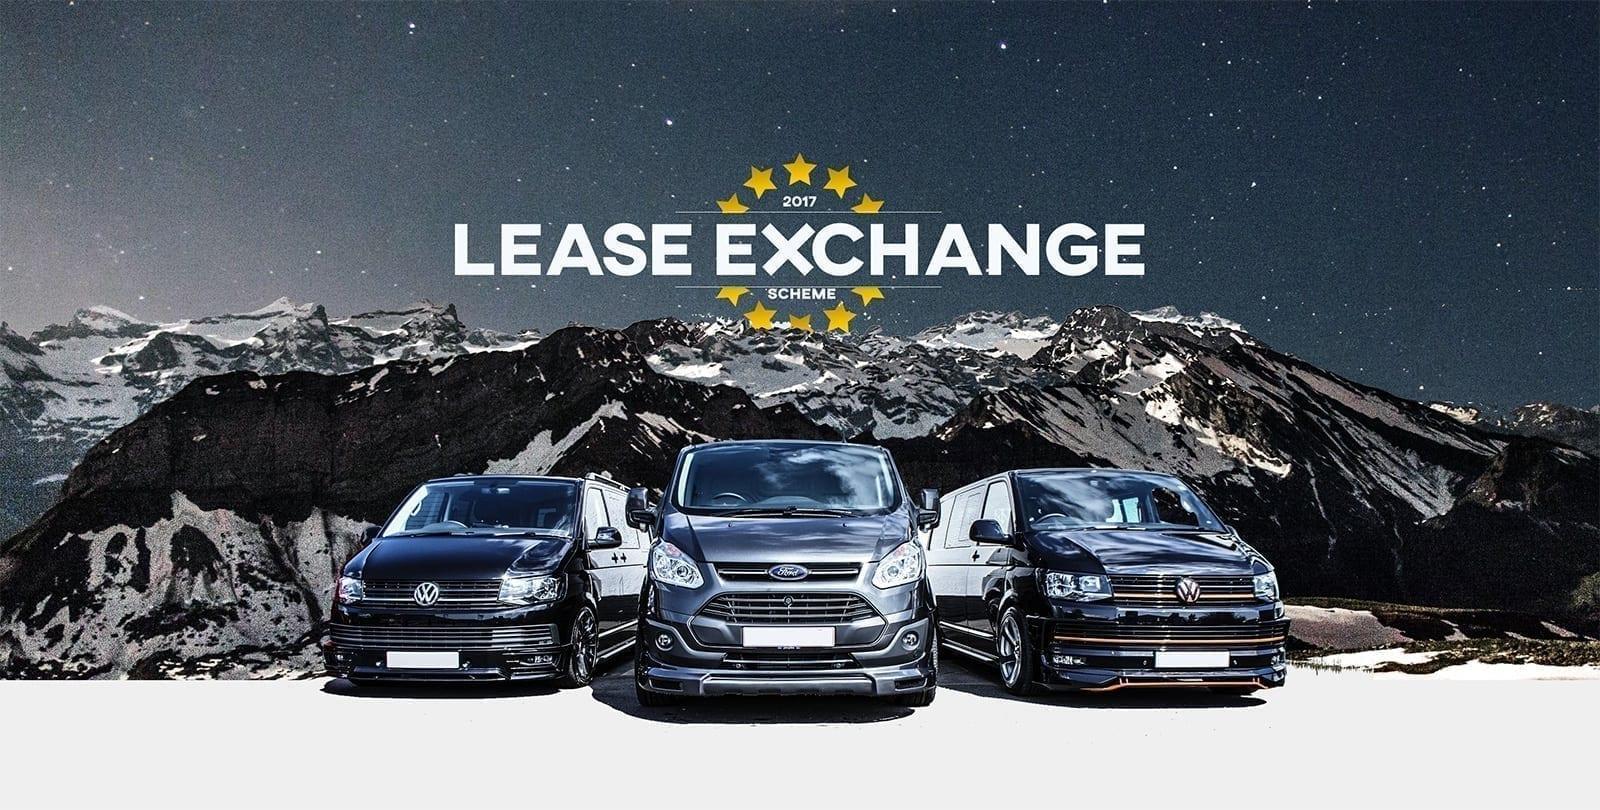 lease exchange pscheme